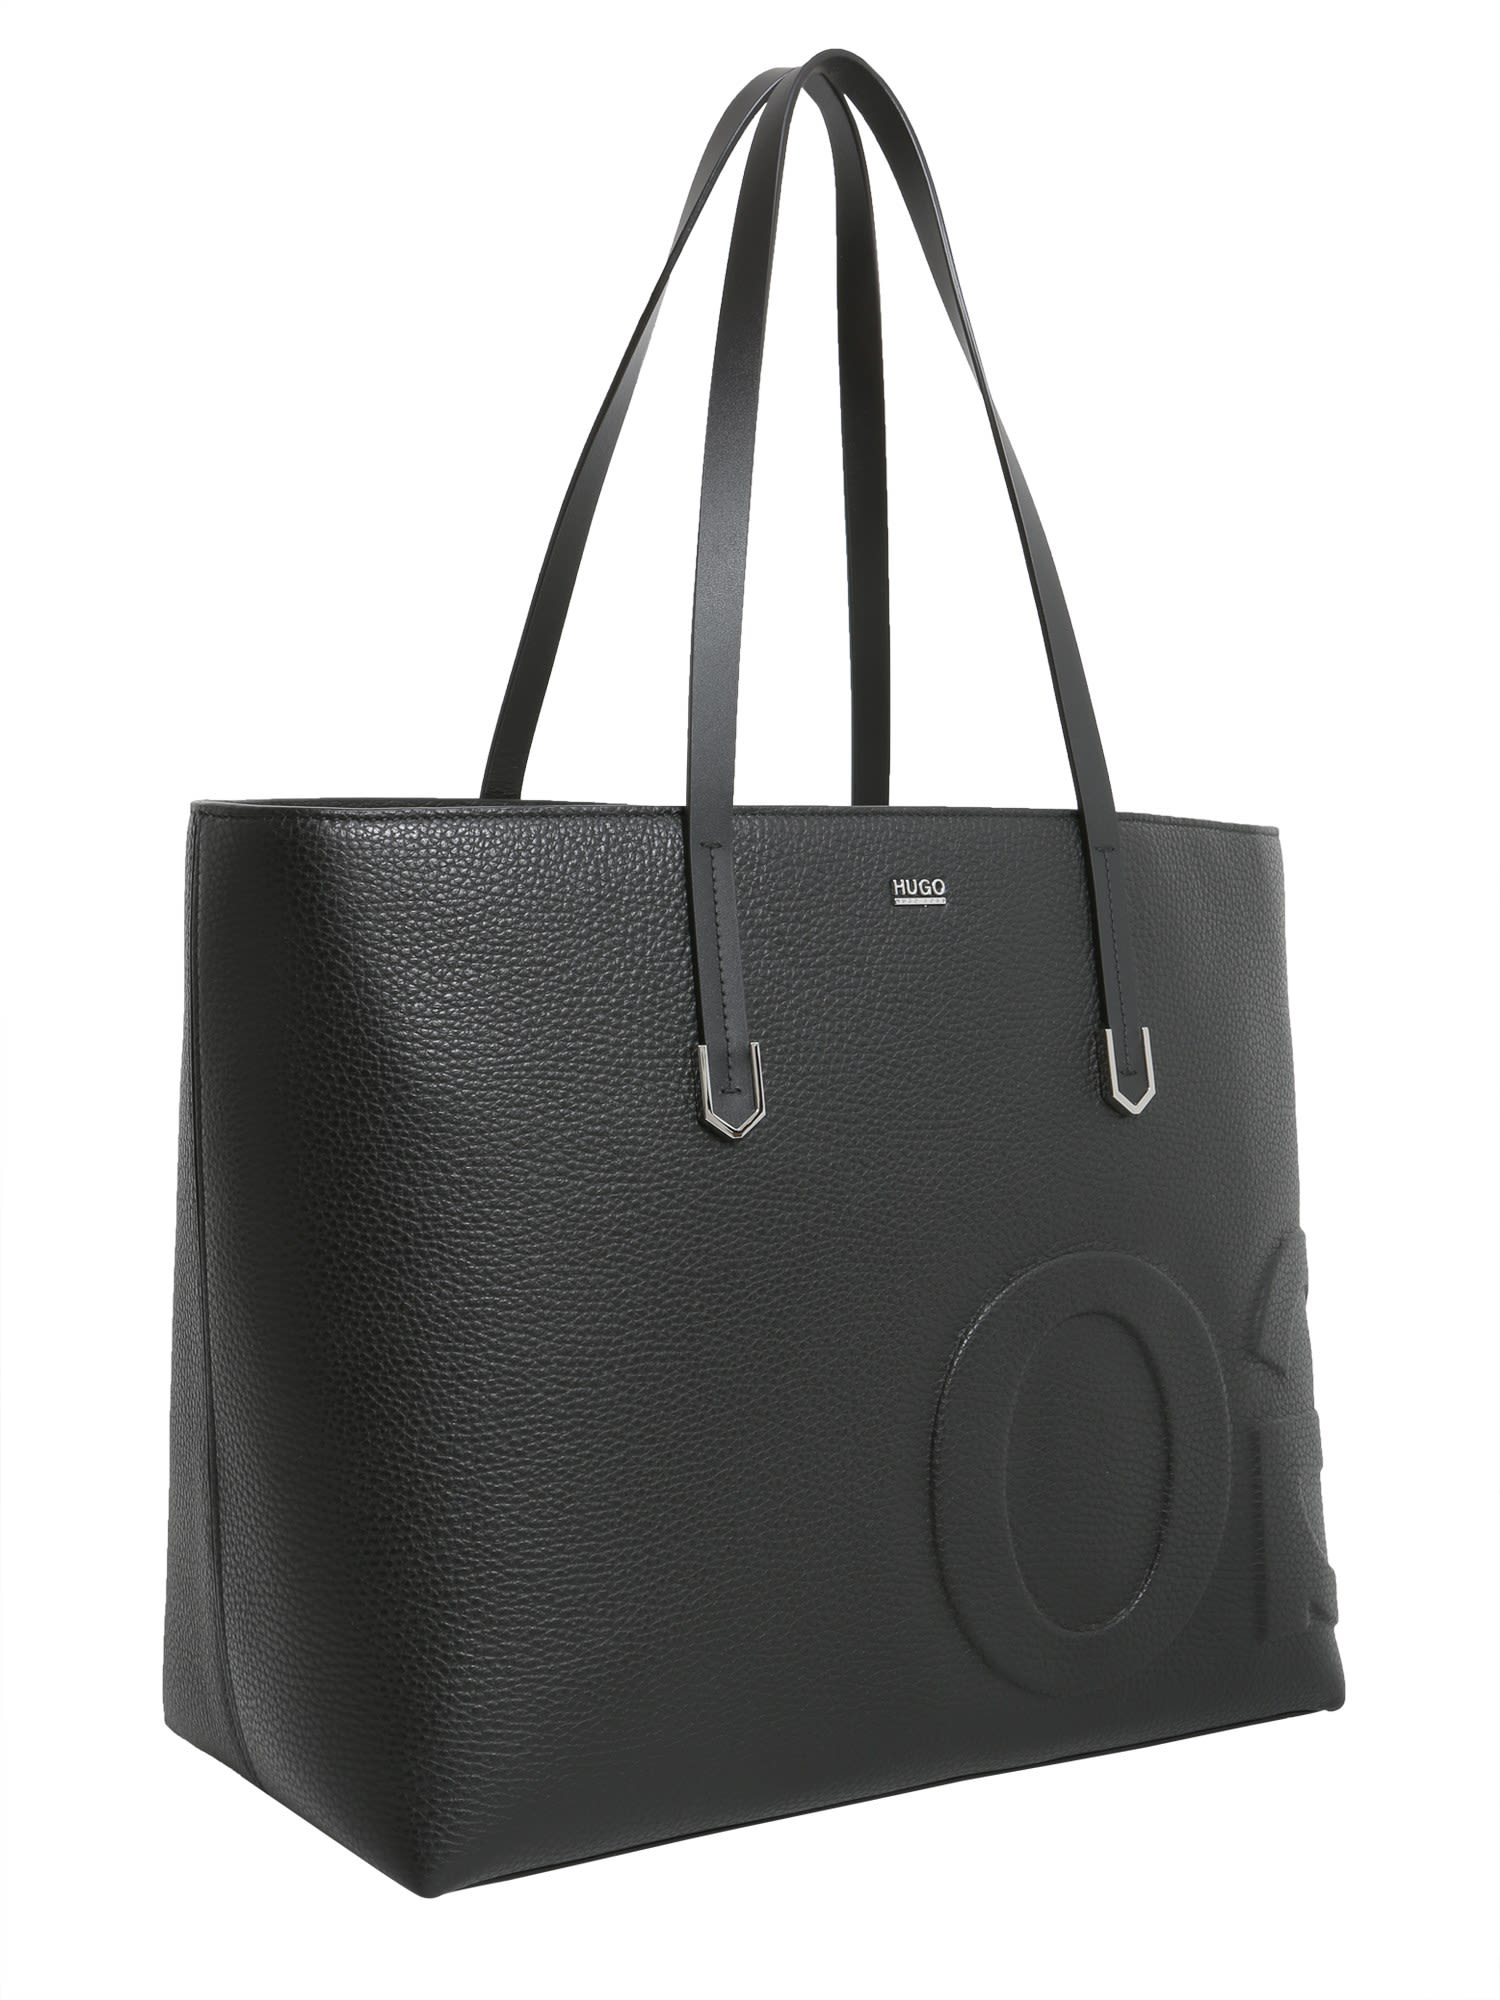 Hugo Boss Nadalia H Tote Bag Nero 7698685 Italist